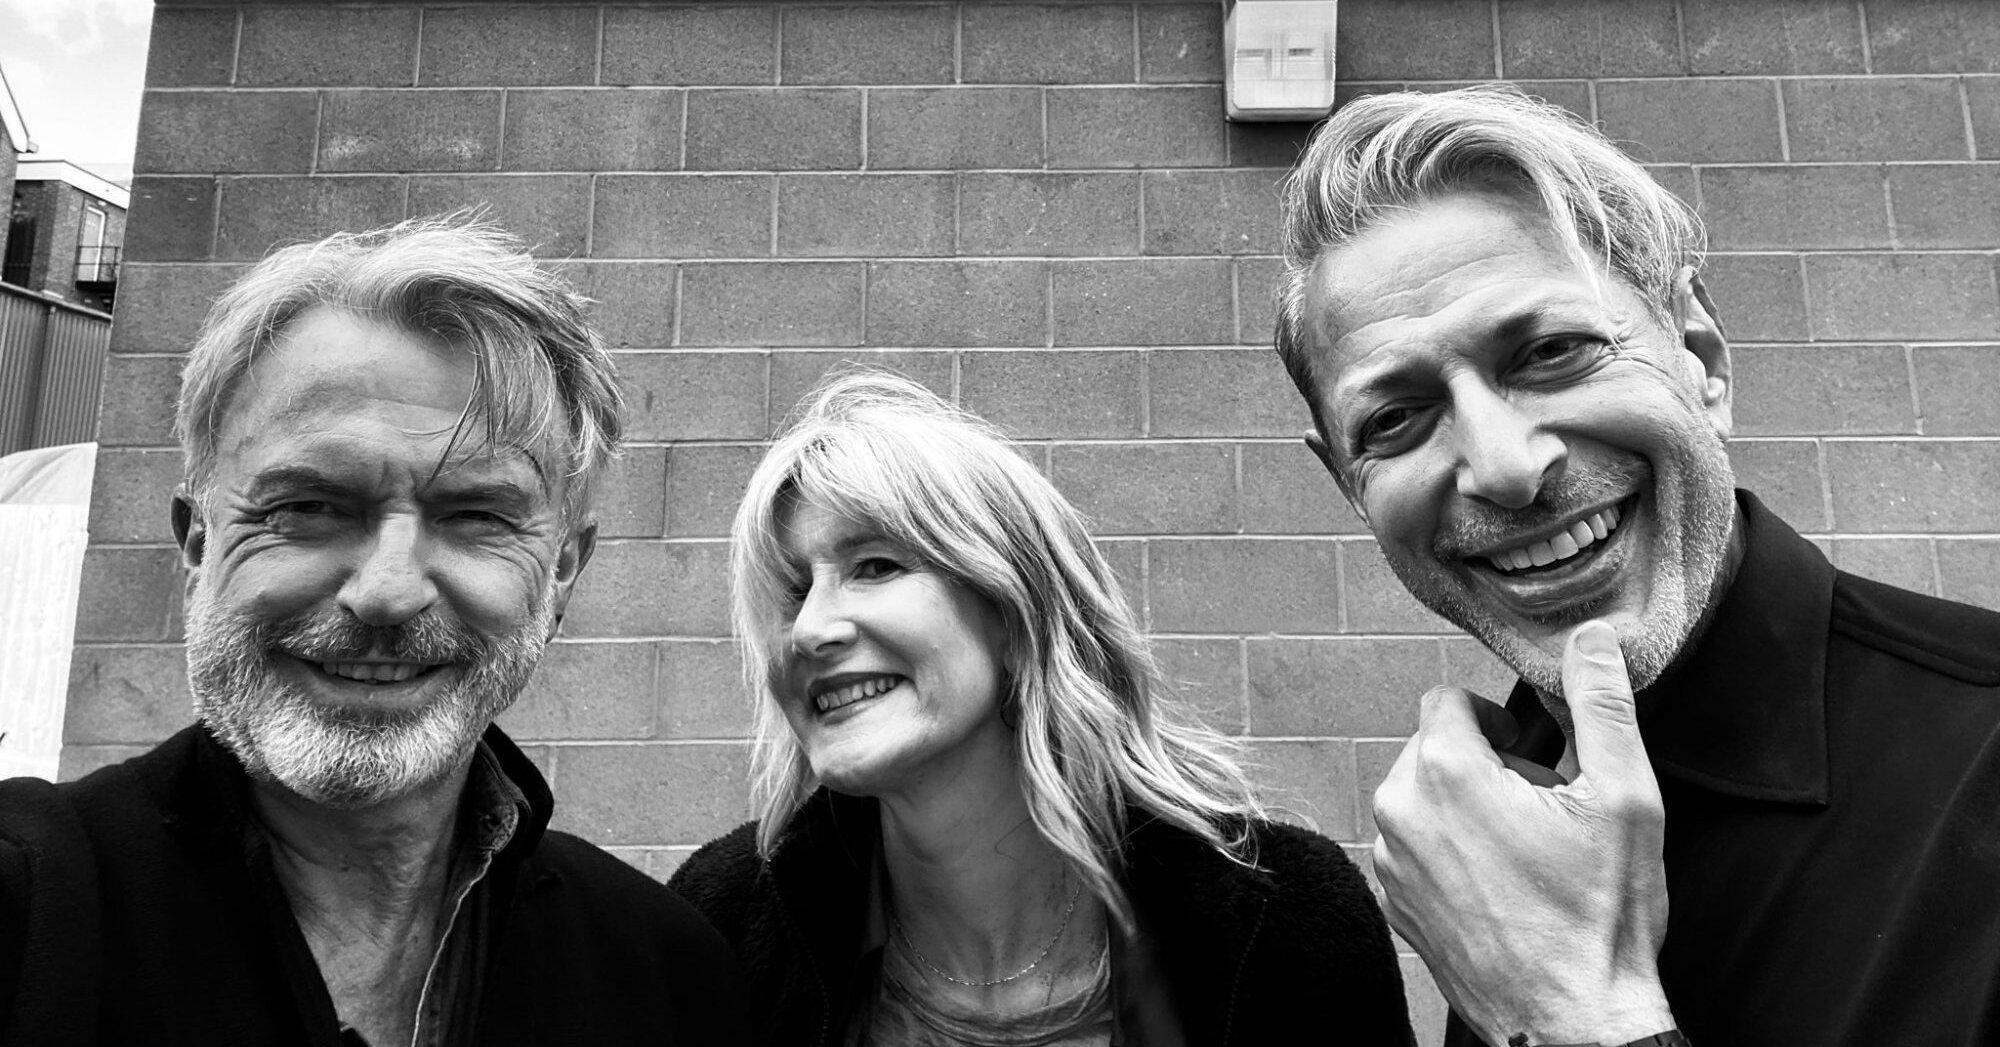 'Jurassic Park' trio reunite as 'Jurassic World: Dominion' resumes filming after COVID delays